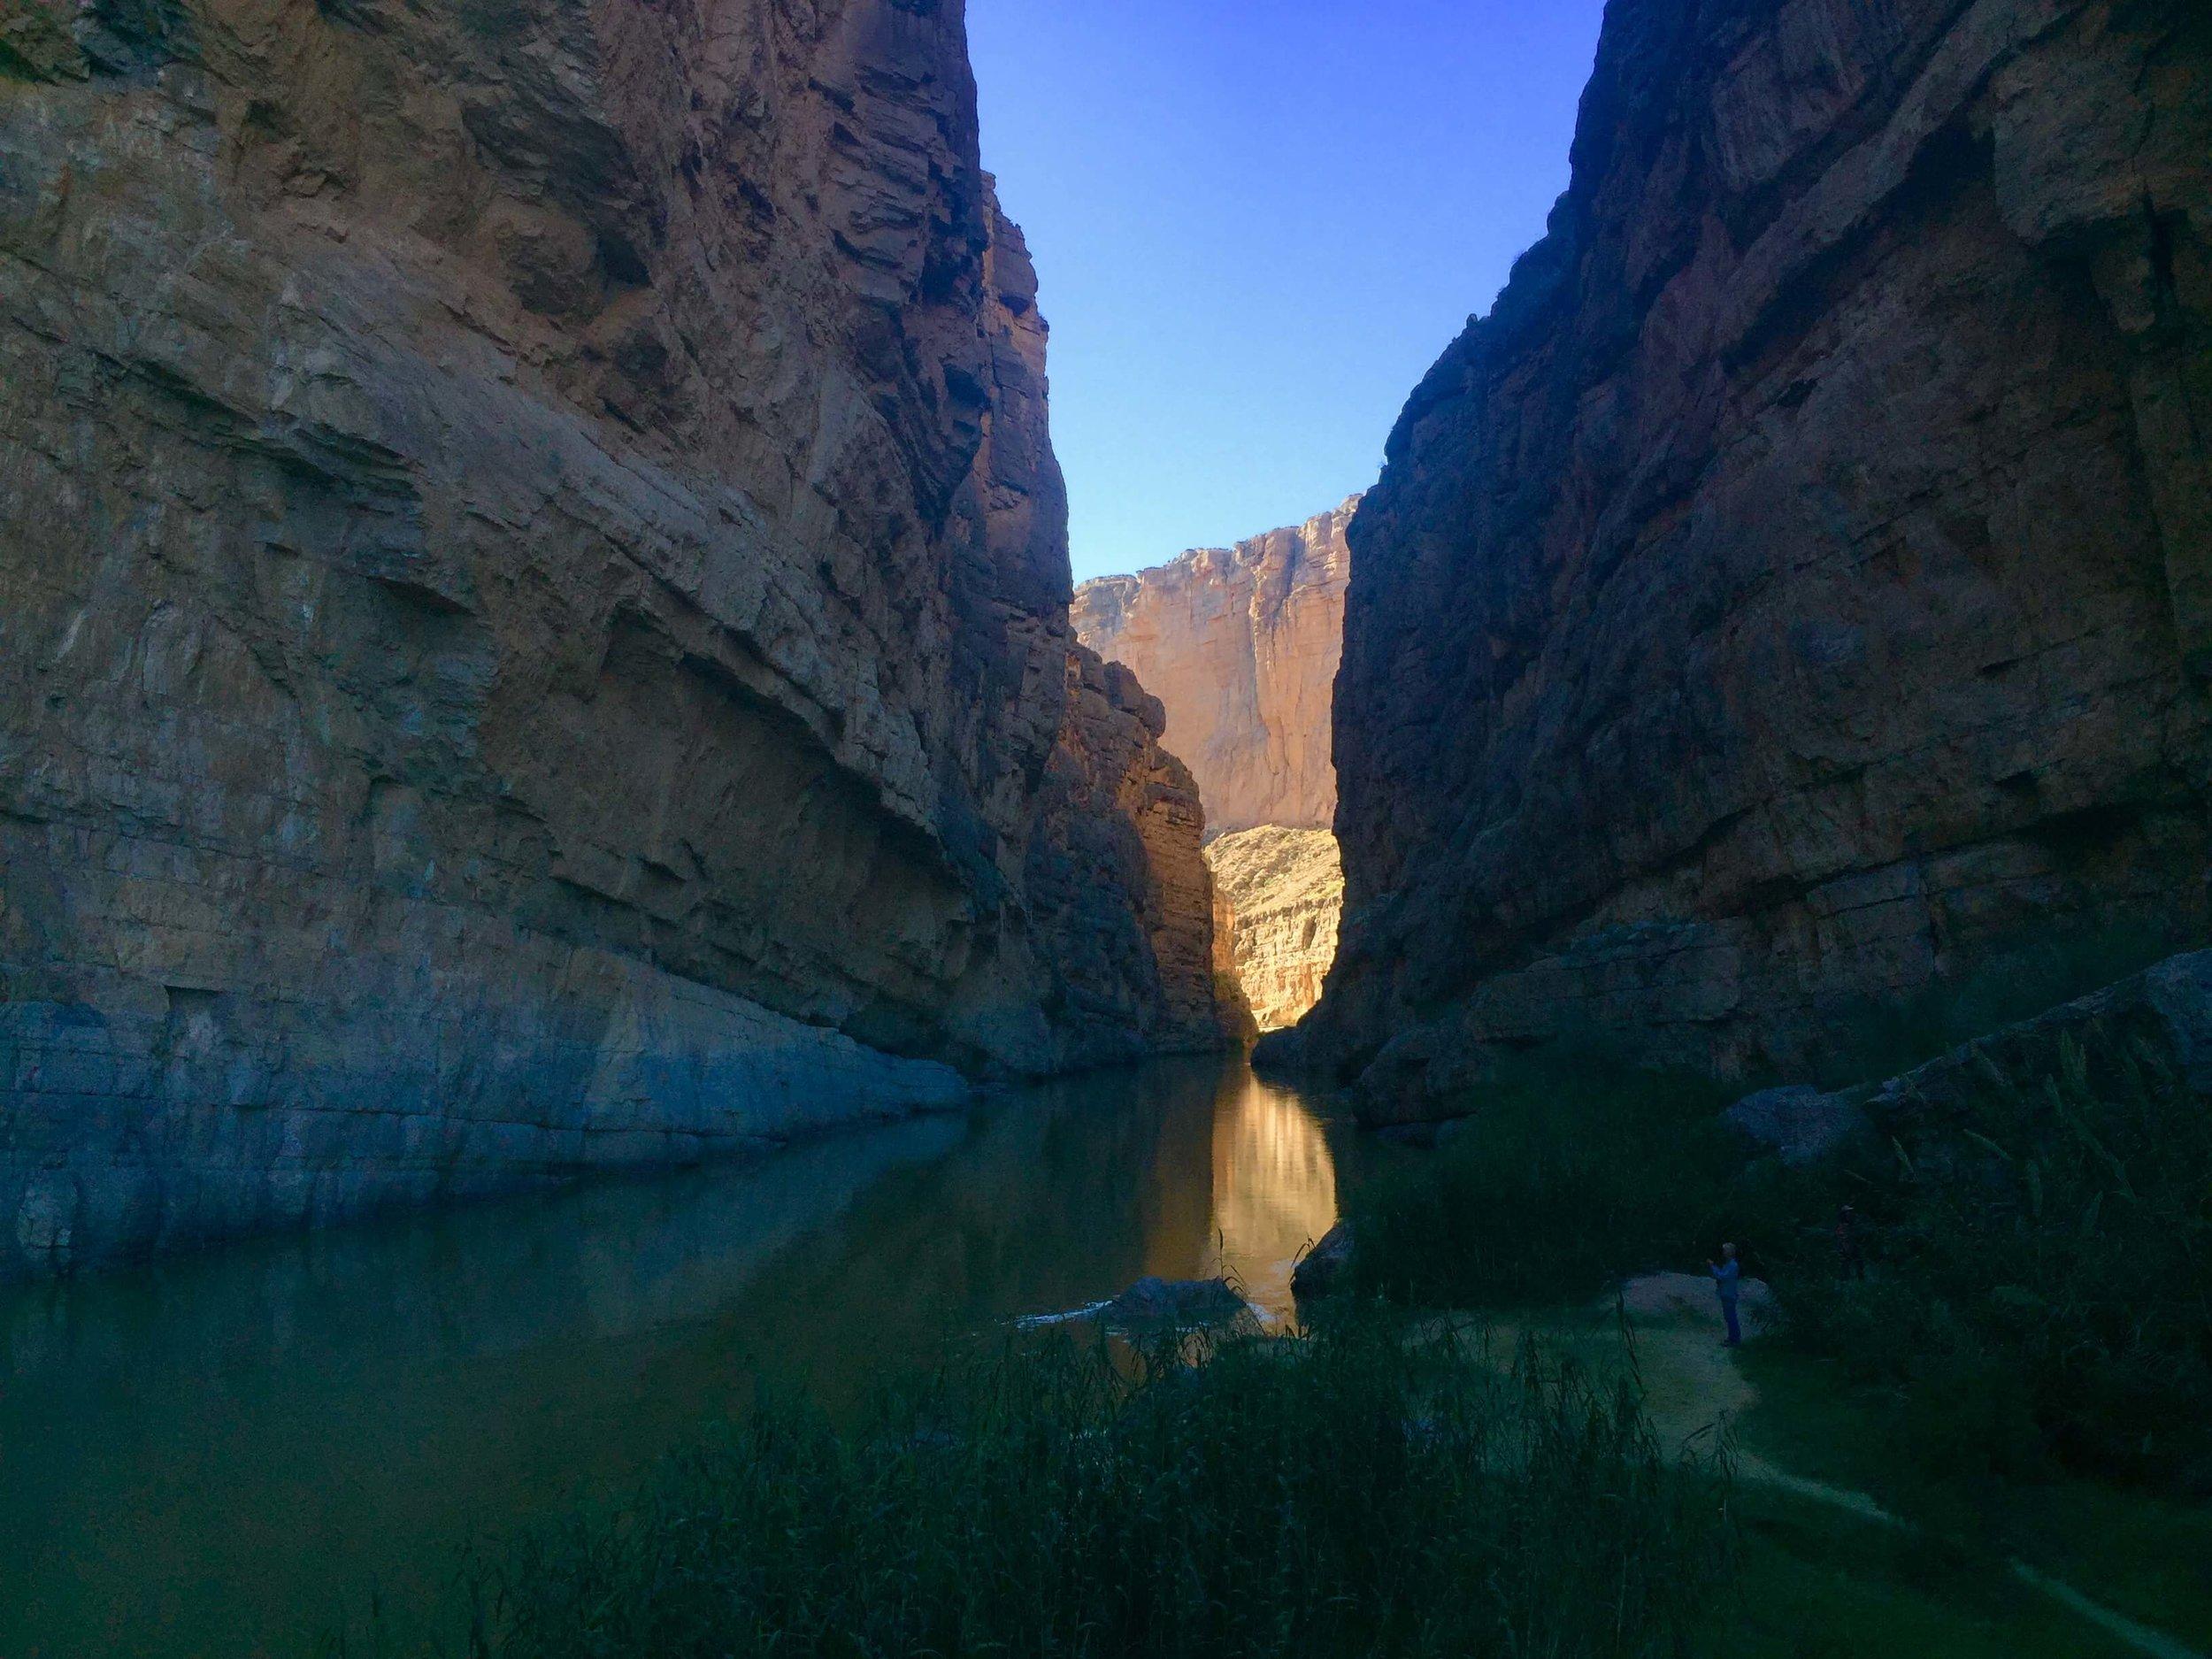 The Santa Elena Canyon in Big Bend National Park